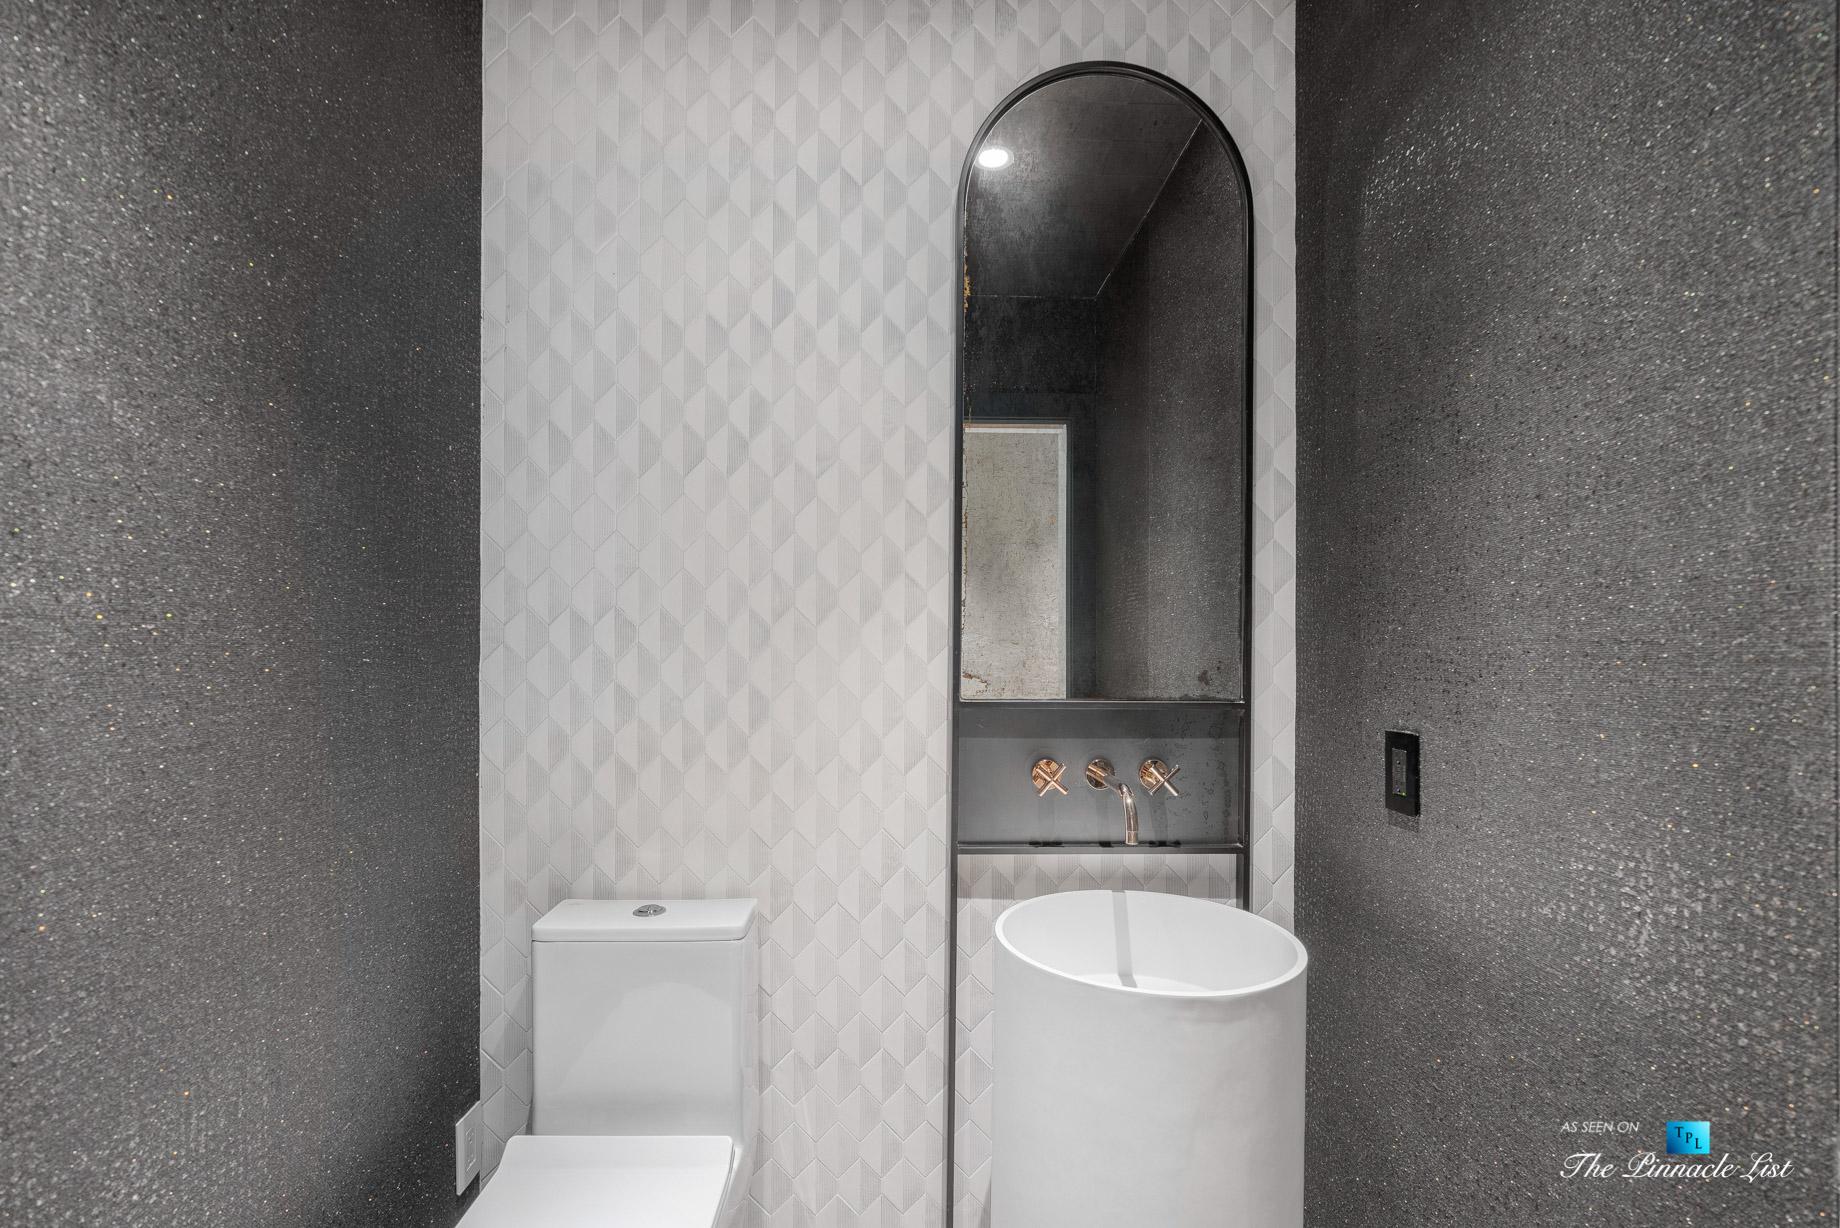 2716 Ridgewood Rd NW, Atlanta, GA, USA - Stylish Modern Washroom - Luxury Real Estate - Modern Contemporary Buckhead Home